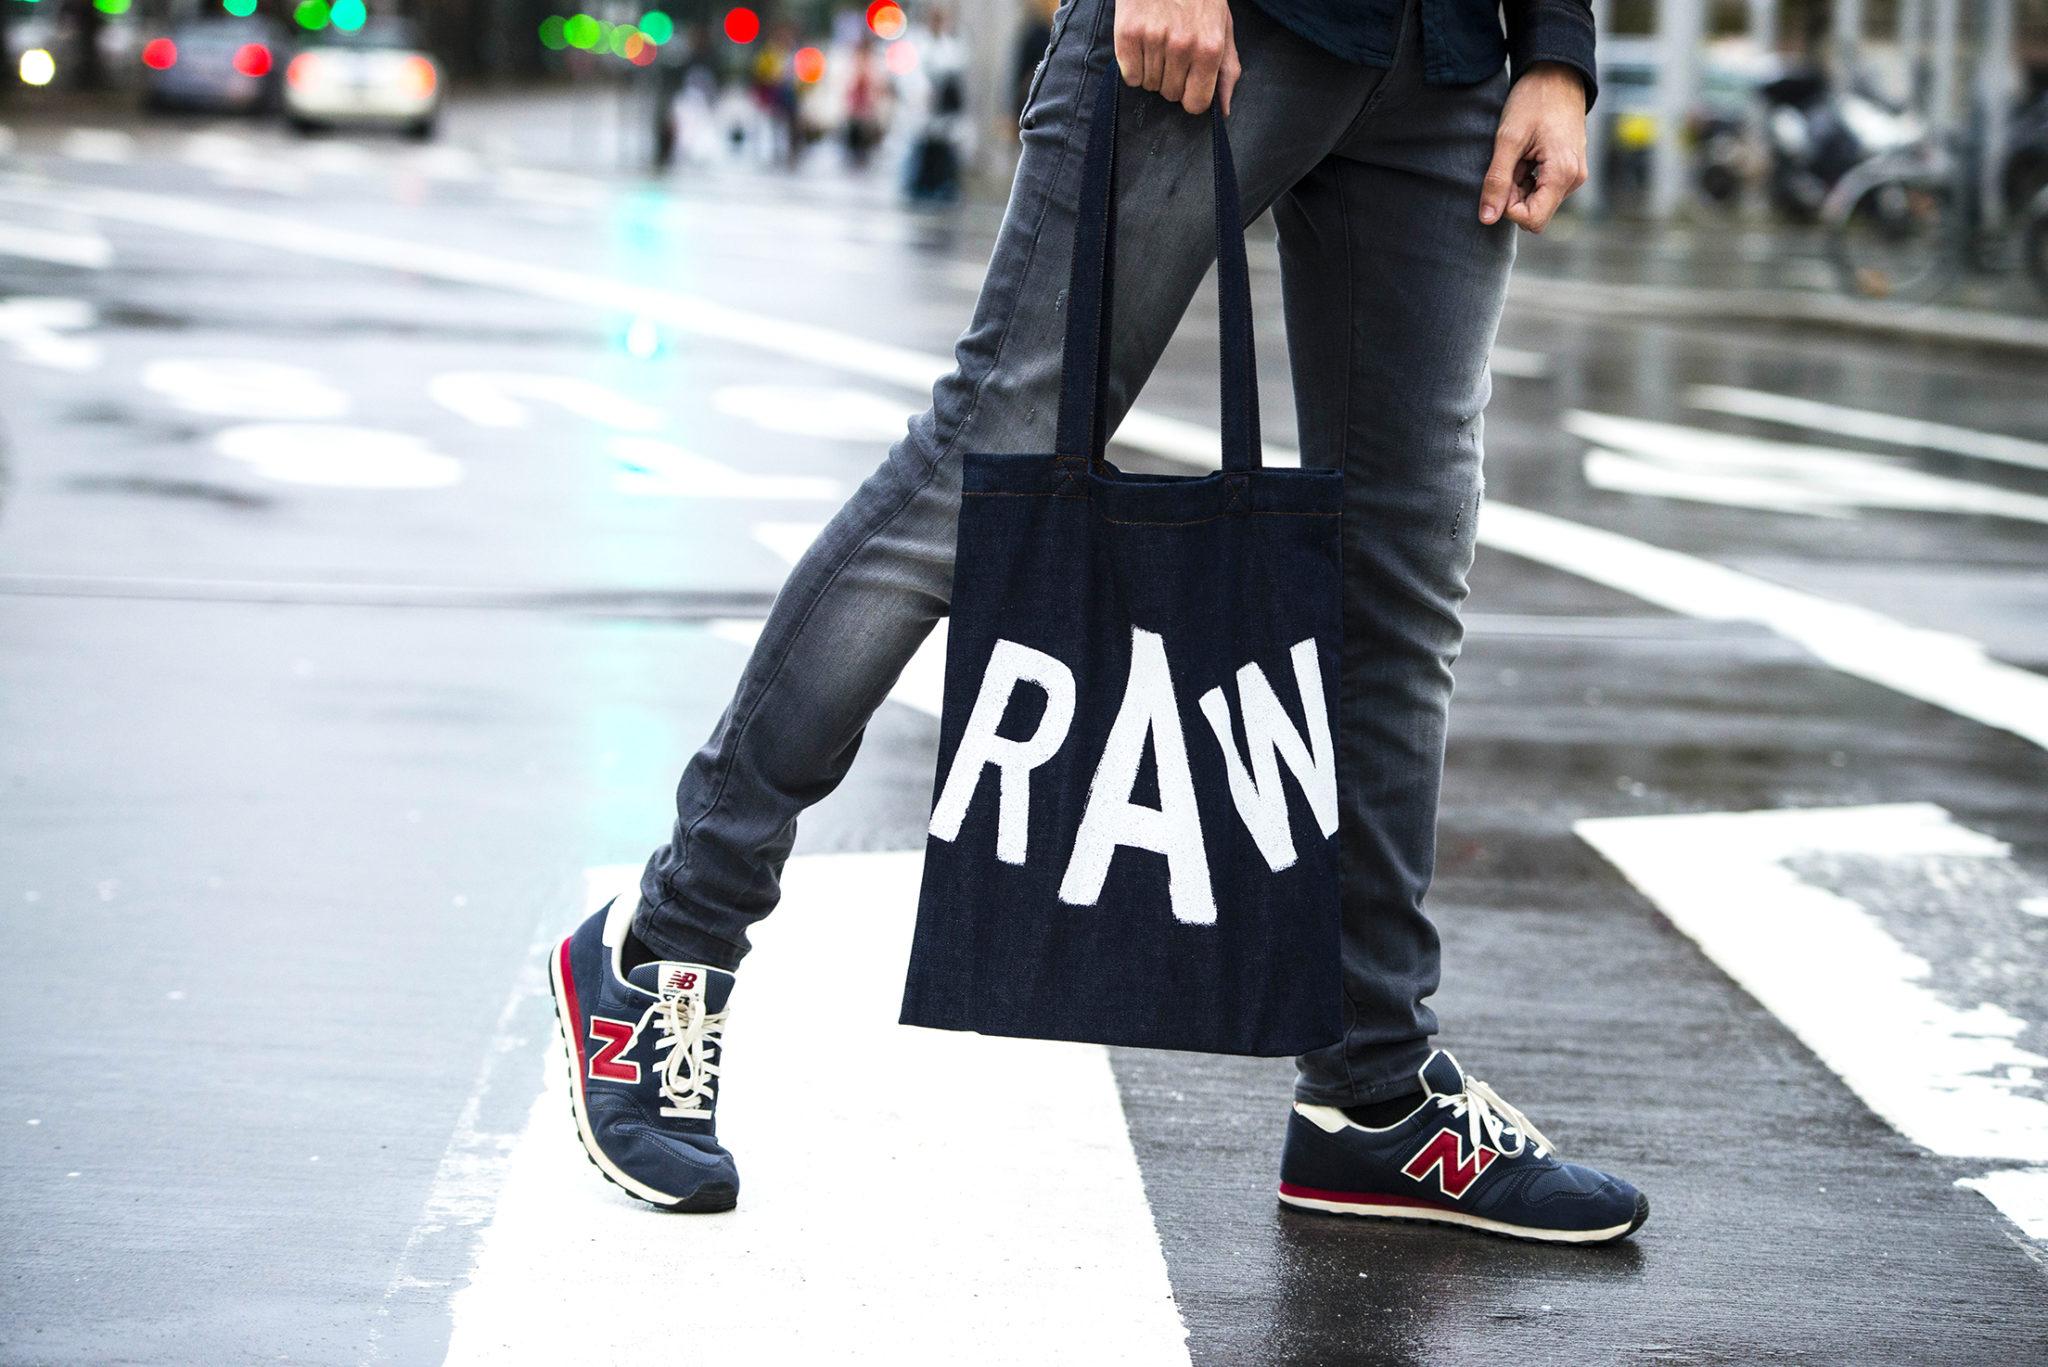 blog-mode-homme-strasbourg-masuculin-paris-lifestyle-blogueur-fashion-blogger-french-gstar-raw-pharrell-jean-denim-edito-8